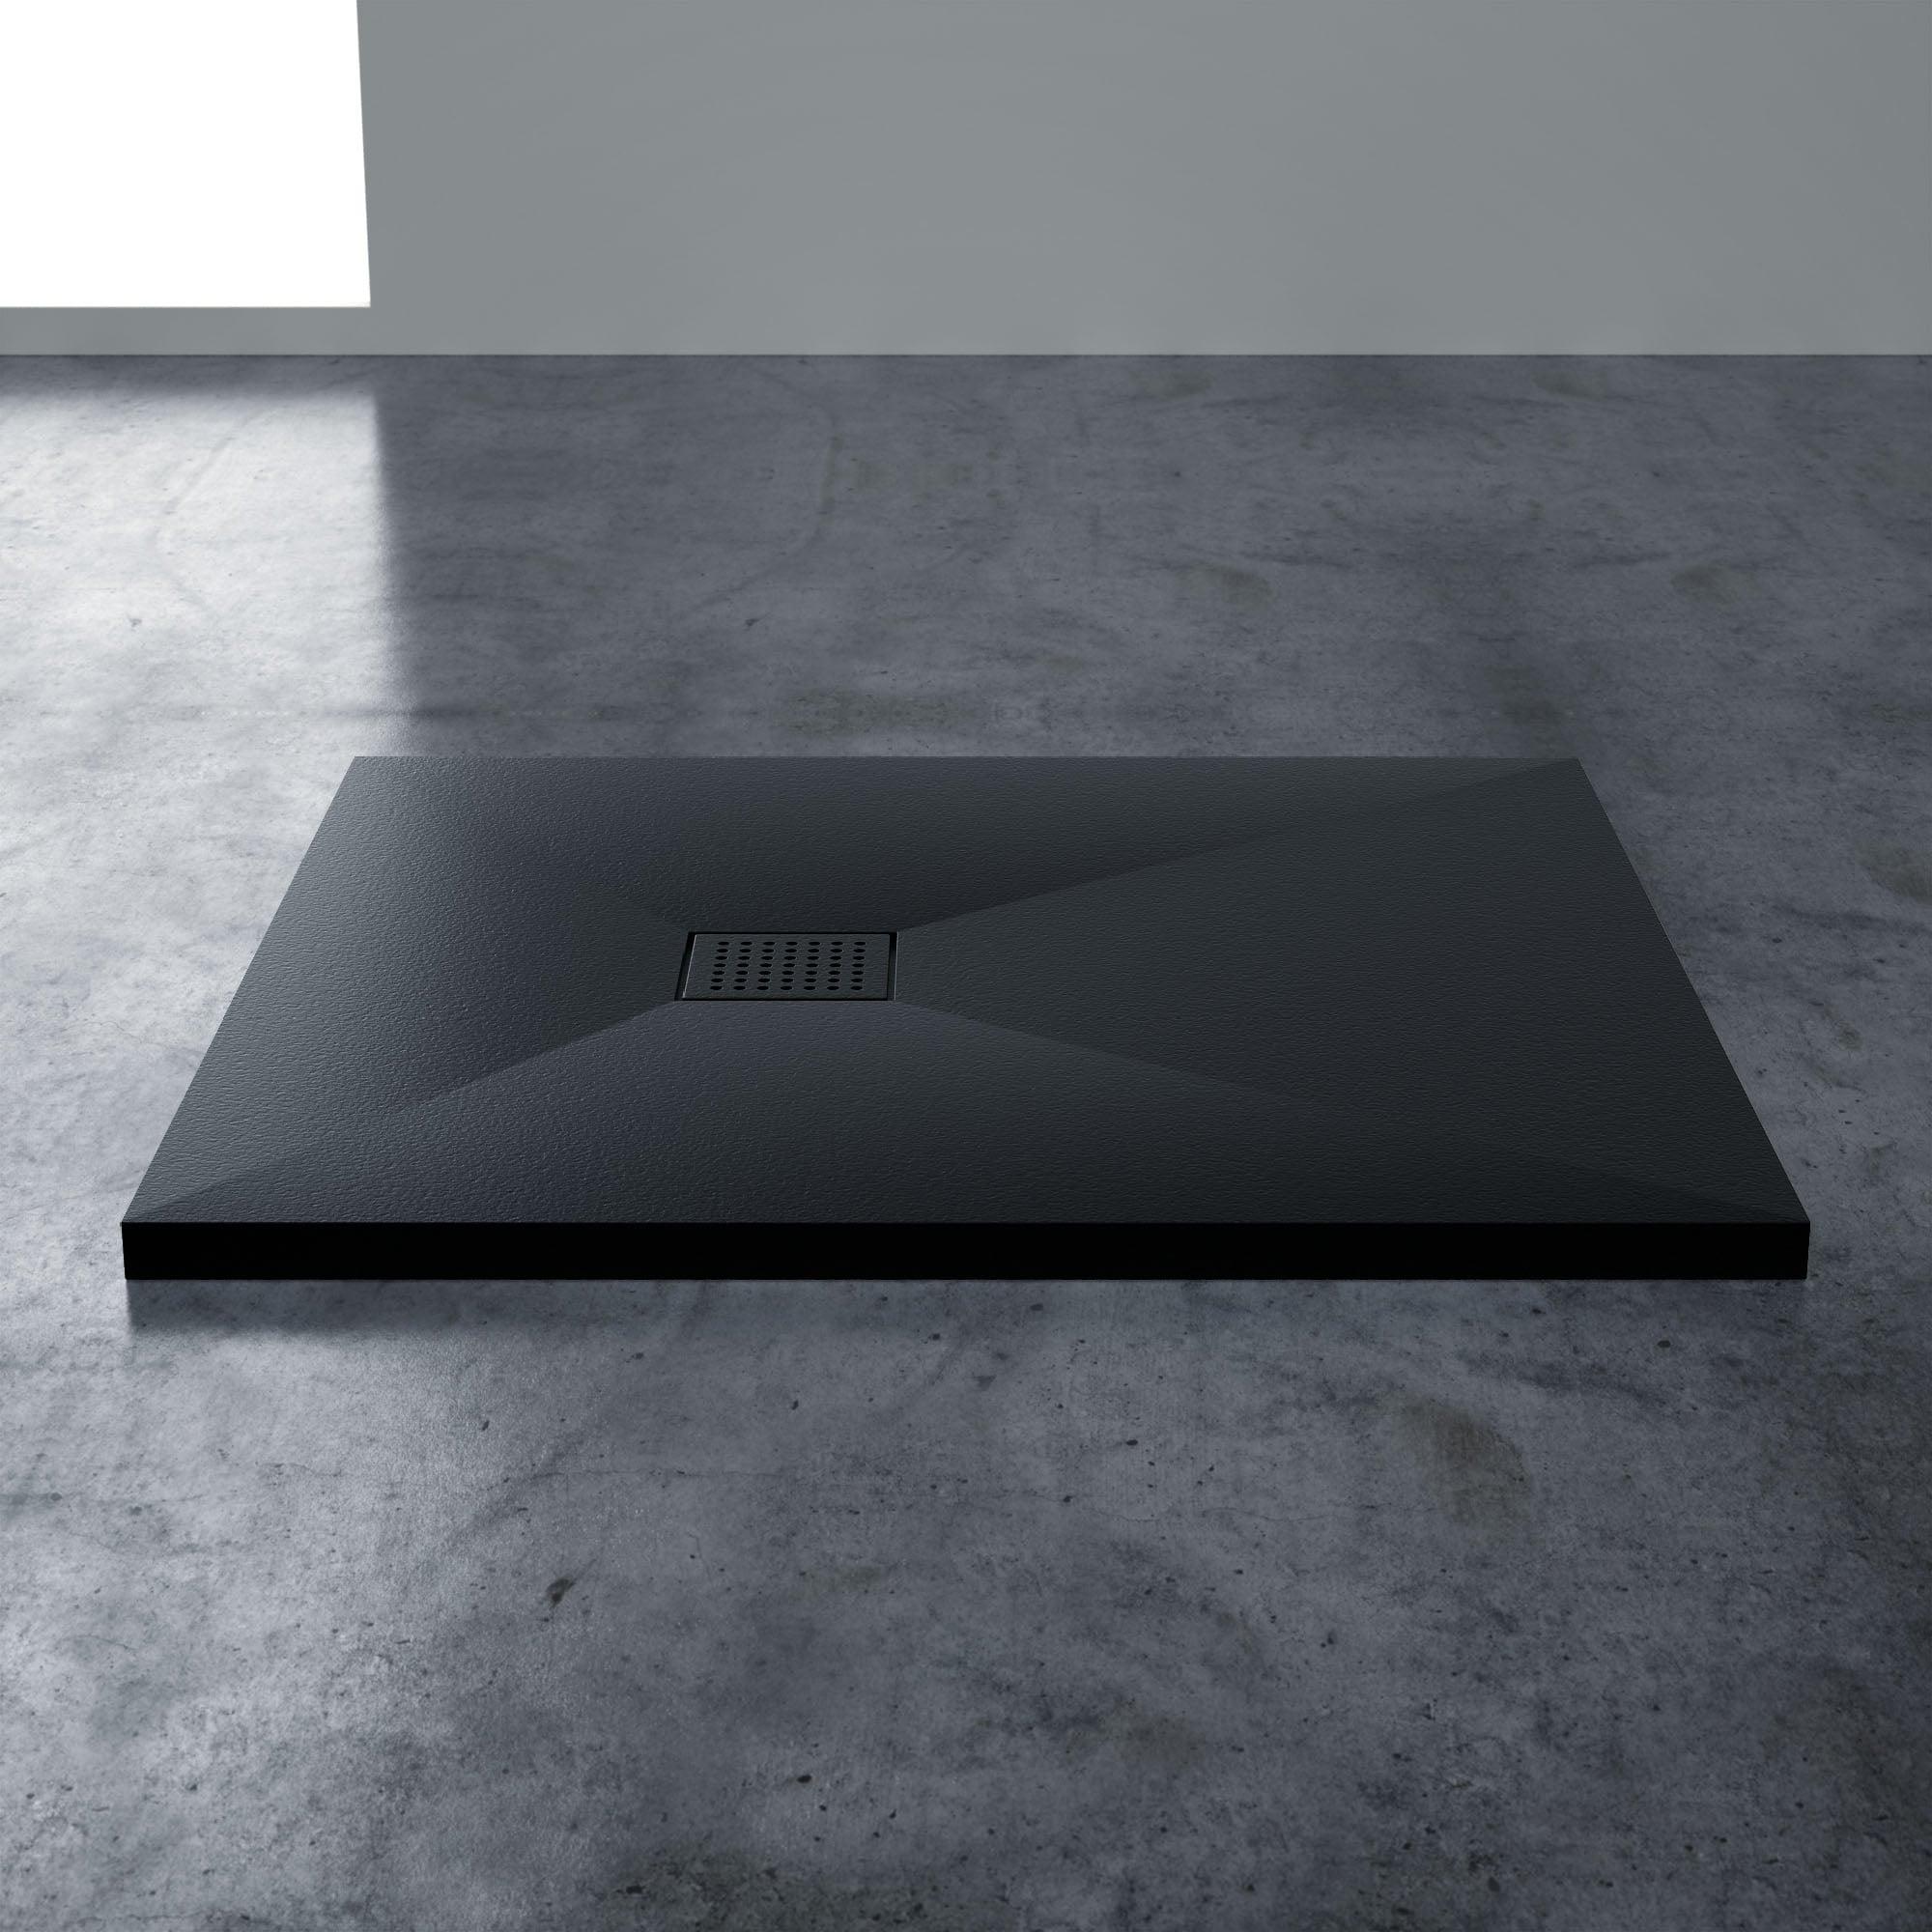 Luxury Matte Shower Tray | Matte Textured Shower Tray | Solid Stone